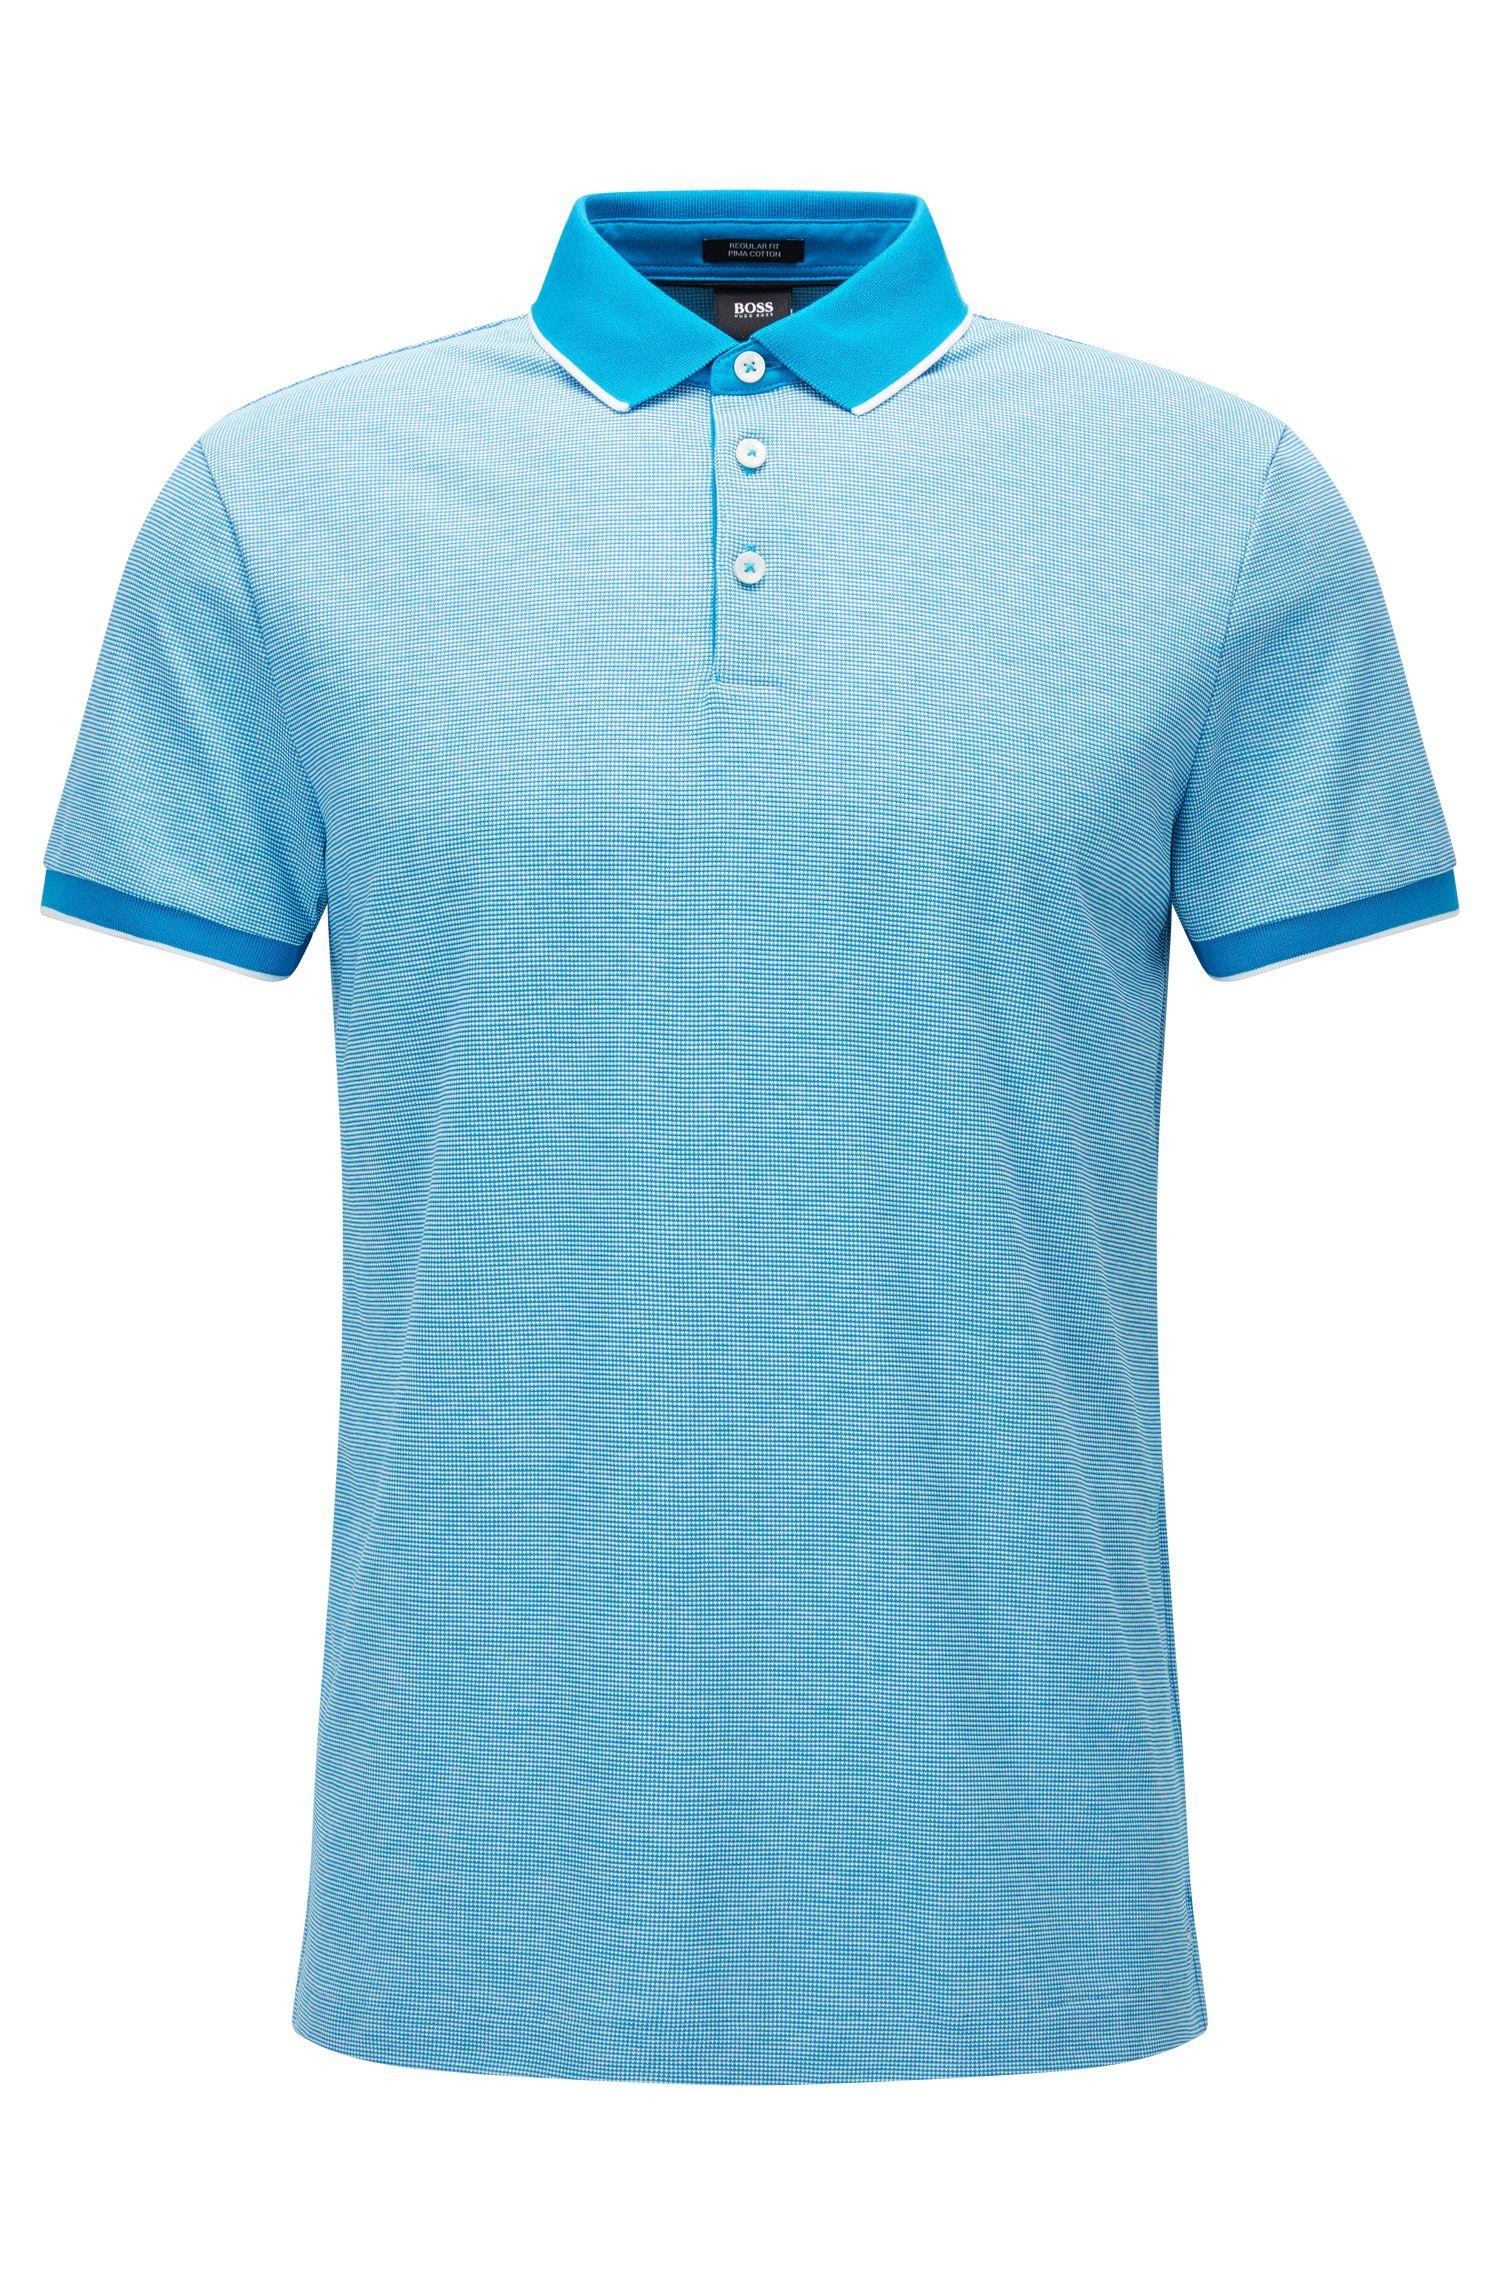 Regular-Fit Poloshirt aus filigran gemustertem Baumwoll-Jacquard